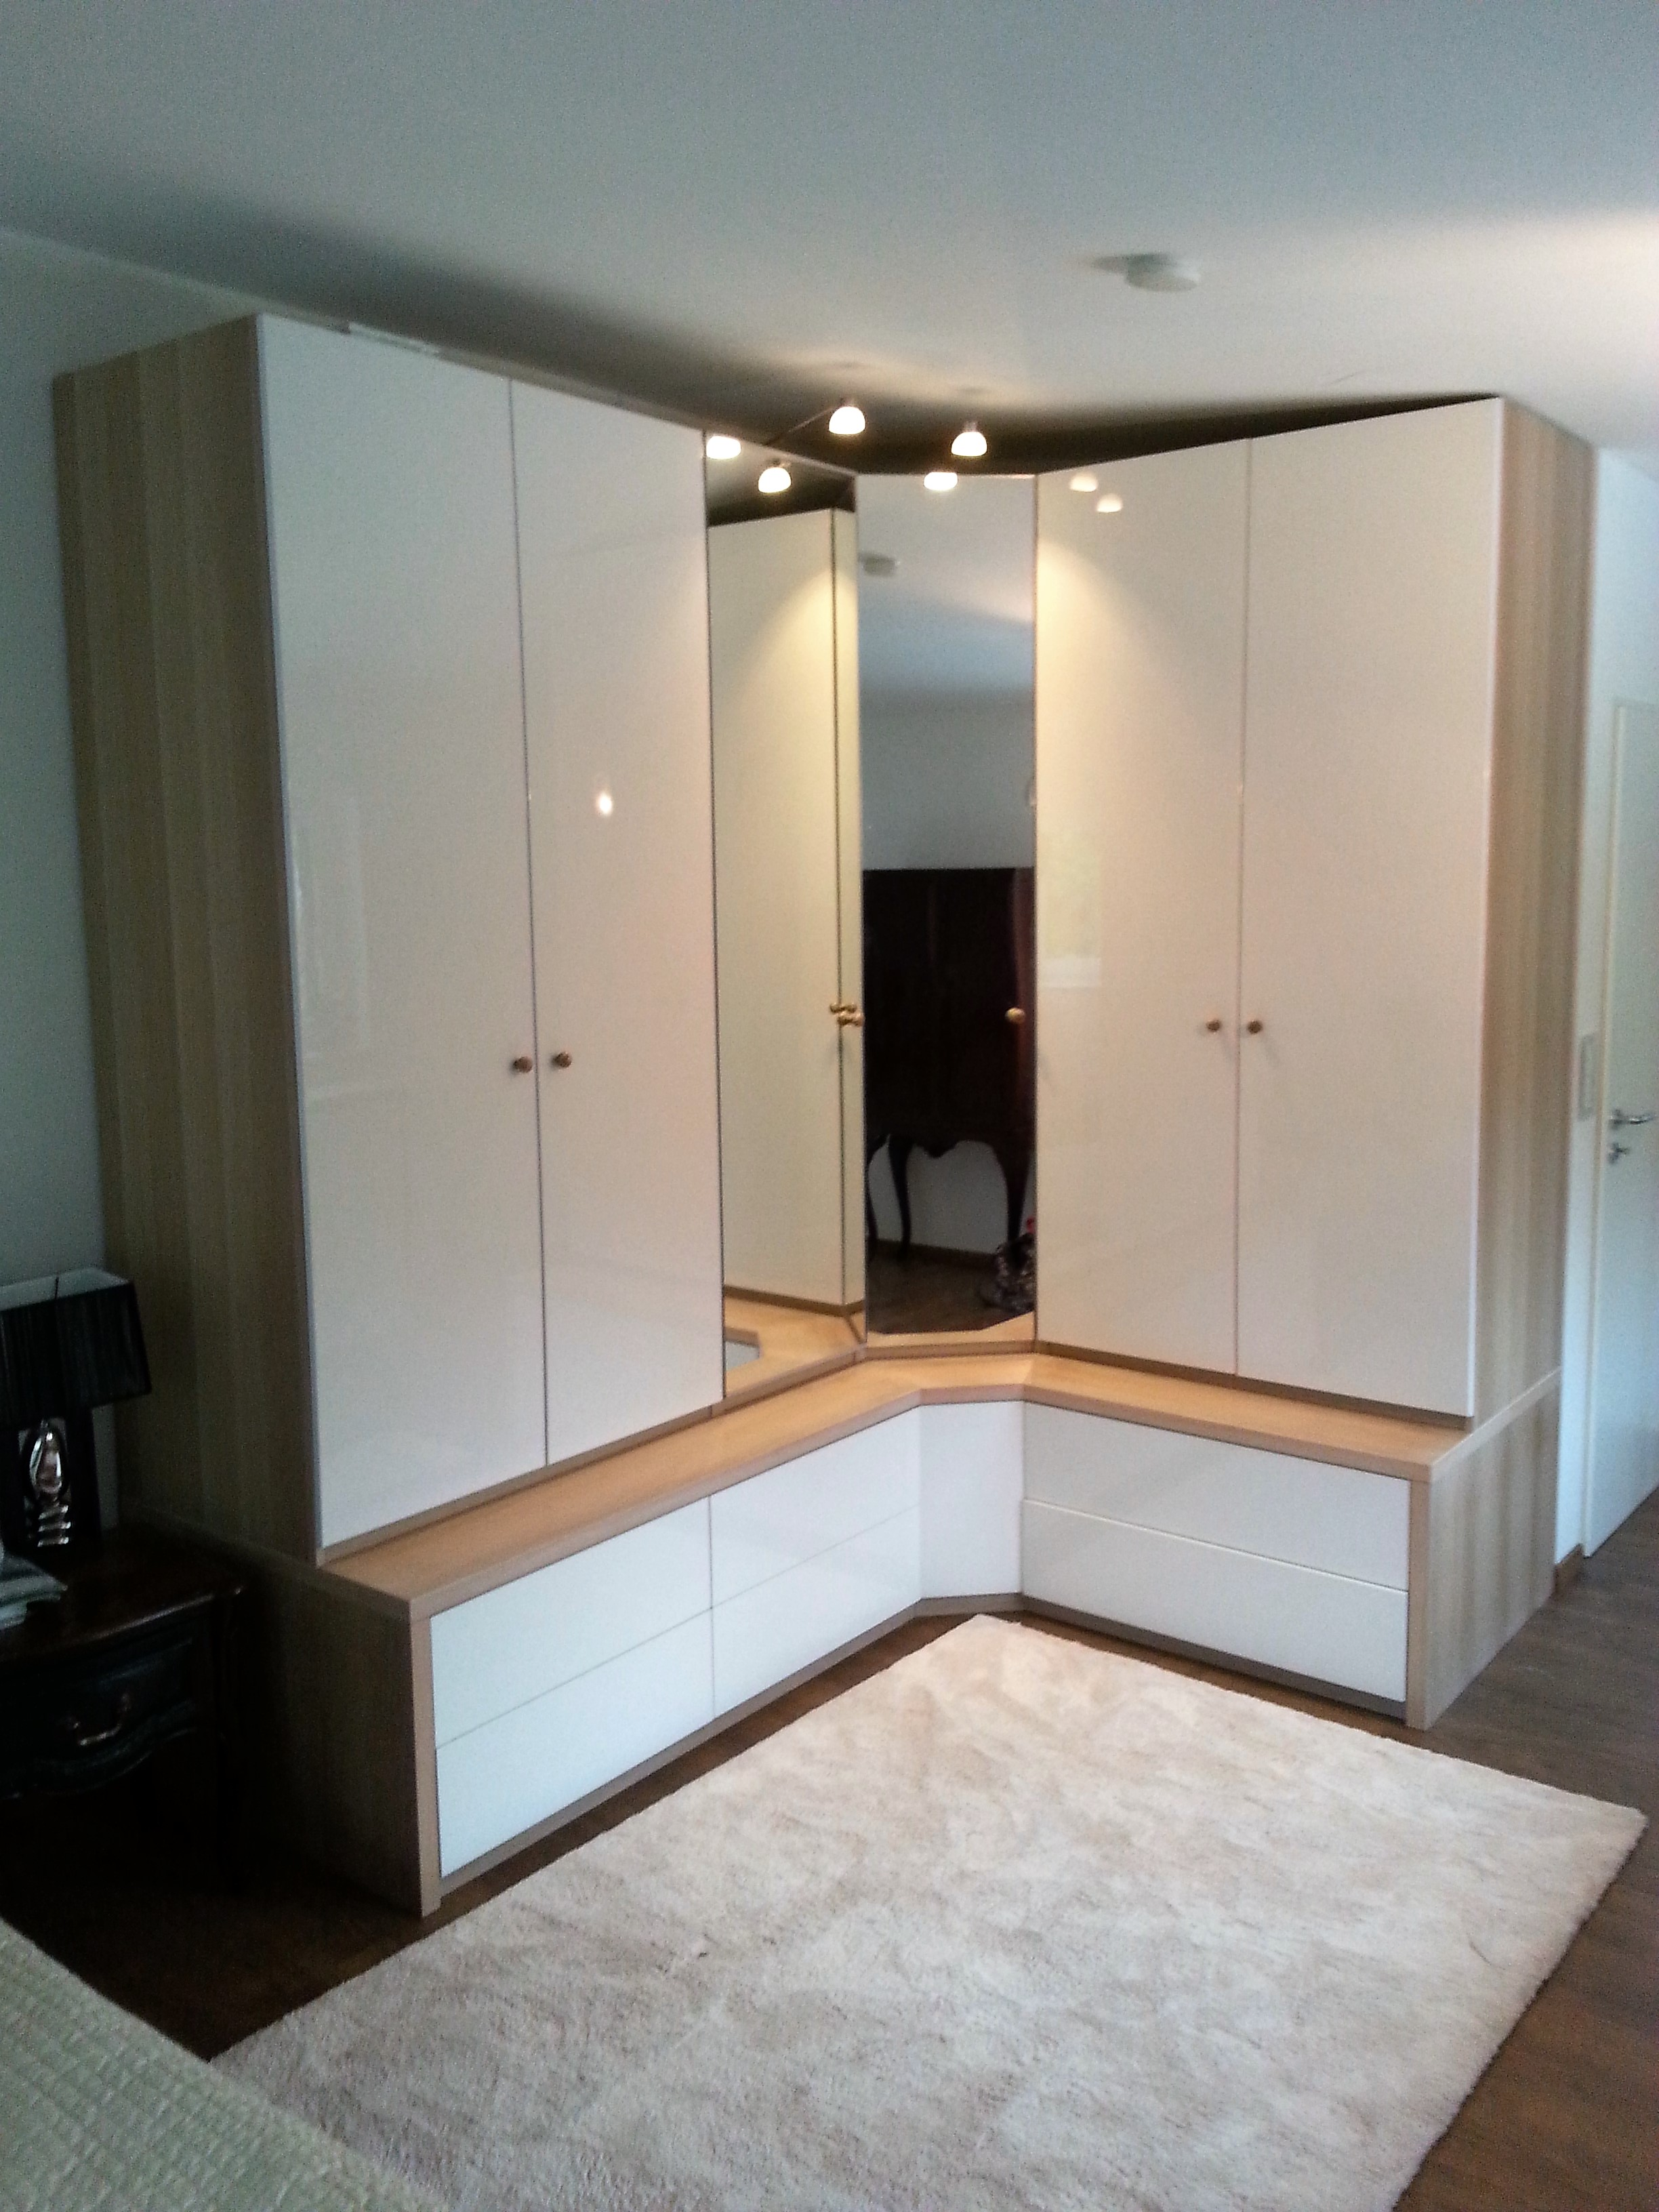 referenzen tischlerei k hn. Black Bedroom Furniture Sets. Home Design Ideas